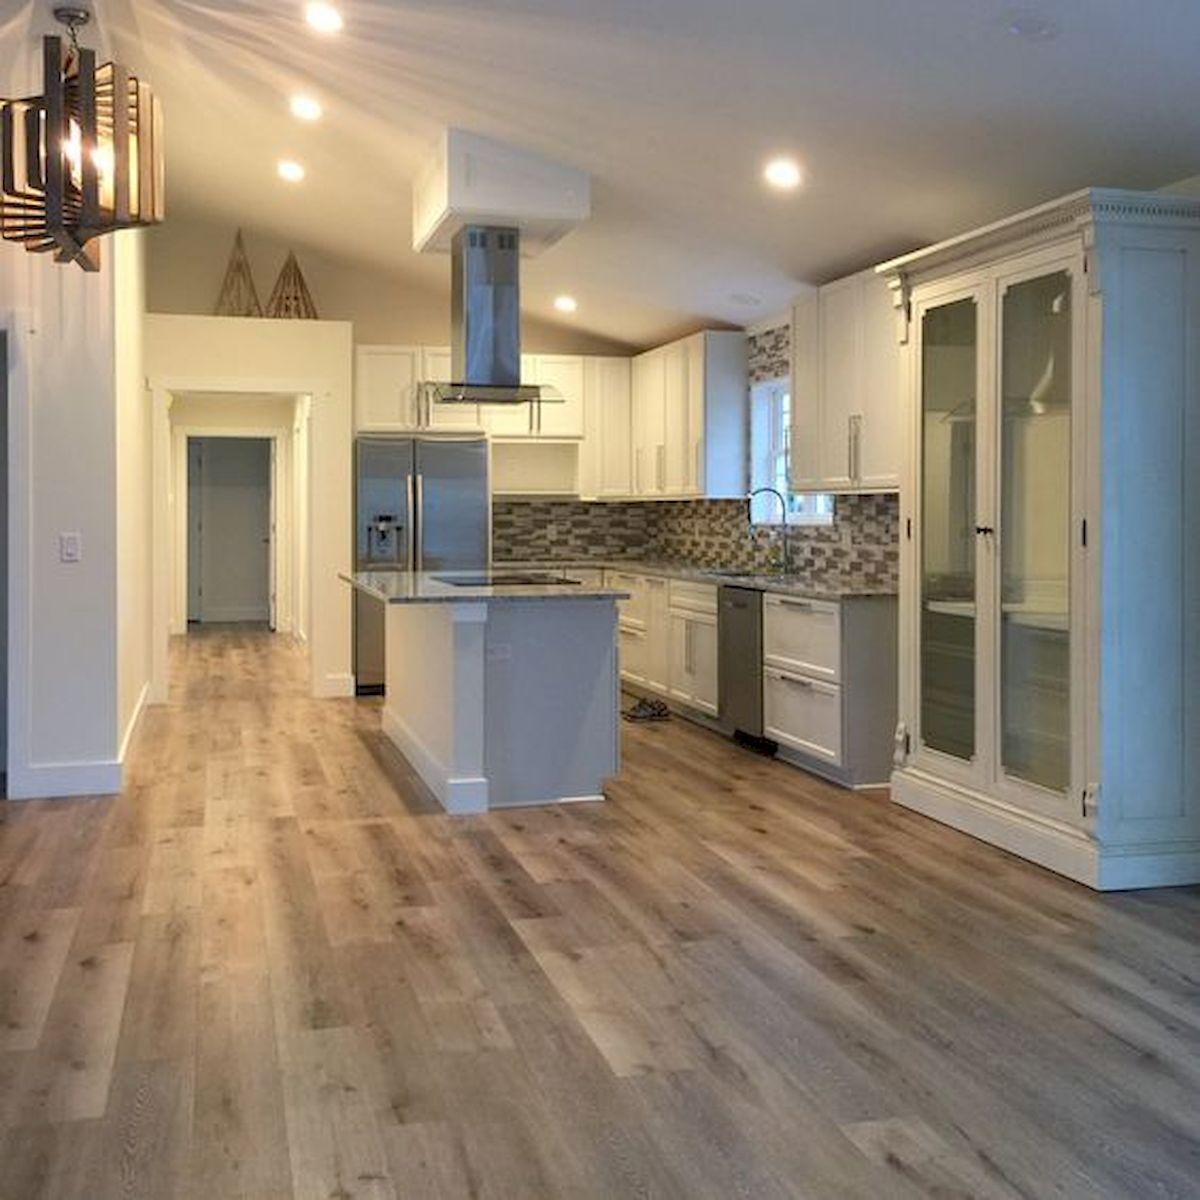 80 Gorgeous Hardwood Floor Ideas for Interior Home (71)